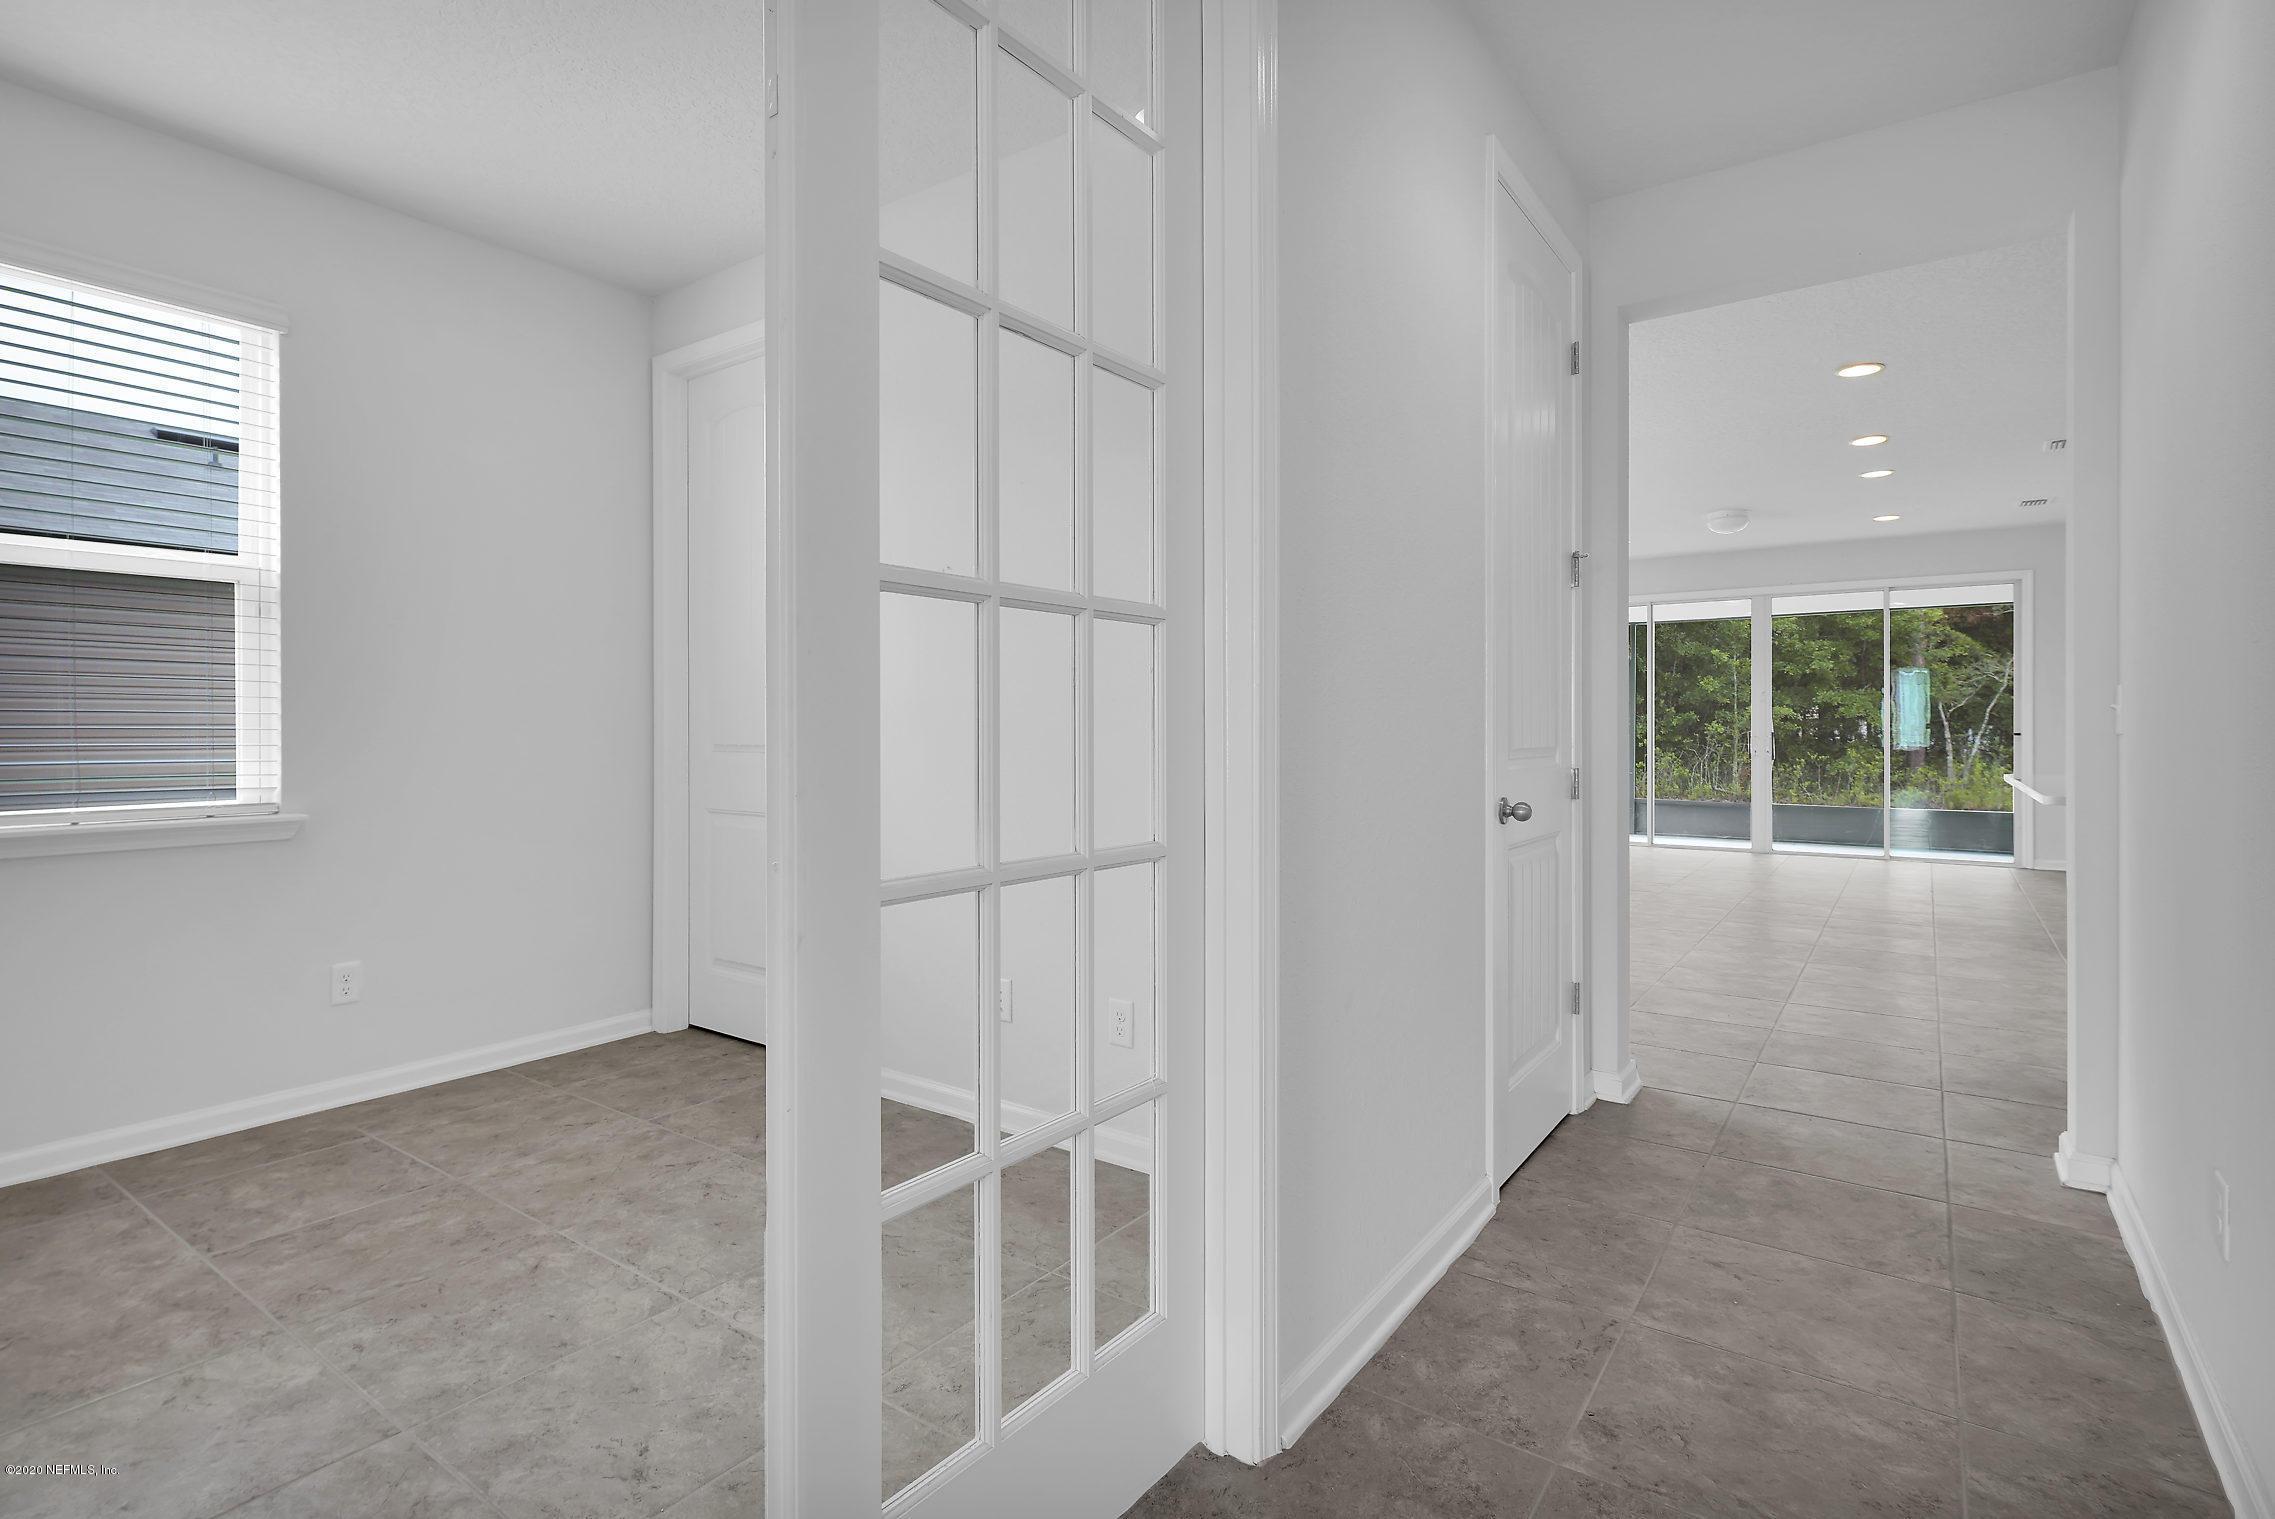 4562 OAK MOSS, MIDDLEBURG, FLORIDA 32068, 3 Bedrooms Bedrooms, ,3 BathroomsBathrooms,Residential,For sale,OAK MOSS,1047304